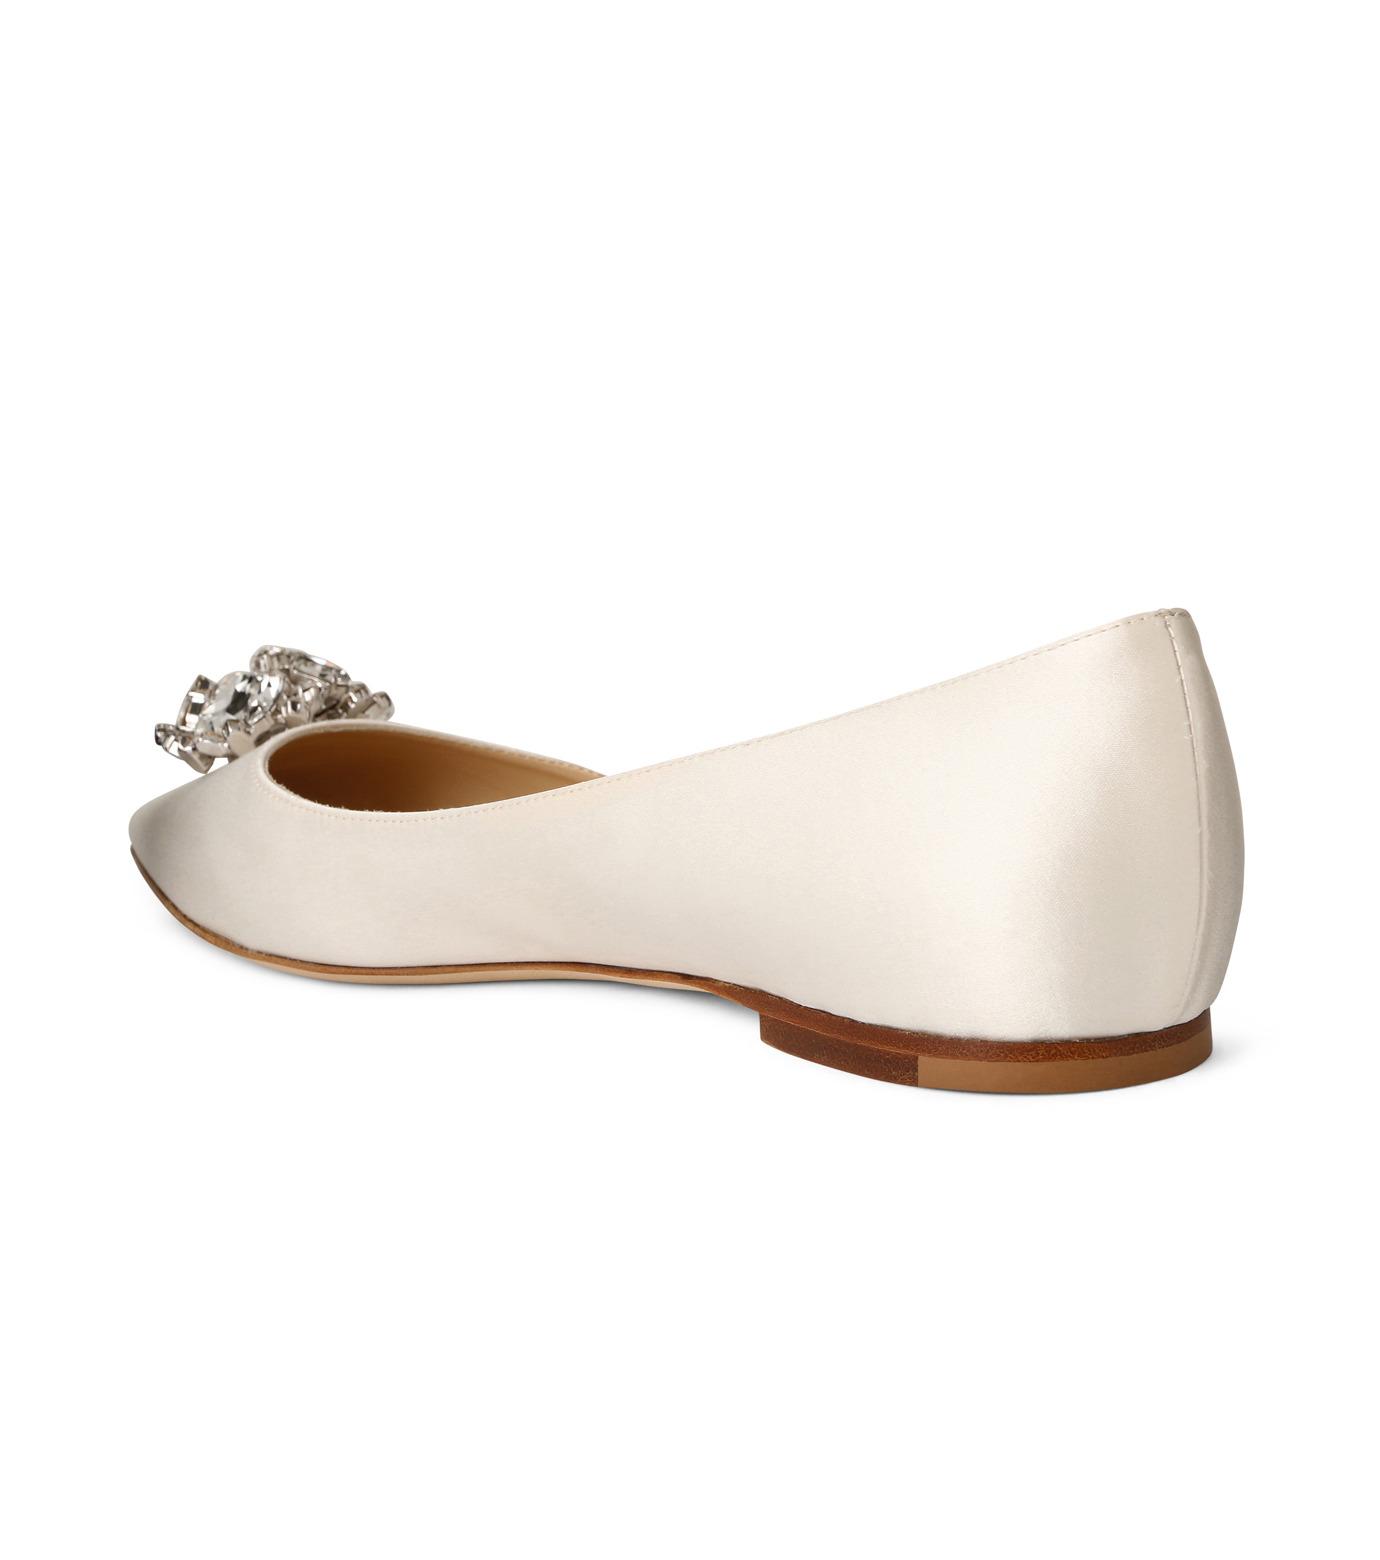 Jimmy Choo(ジミーチュウ)の010STV Satin Flat w/Crystal Brooch-WHITE(フラットシューズ/Flat shoes)-ALINA-5 拡大詳細画像2